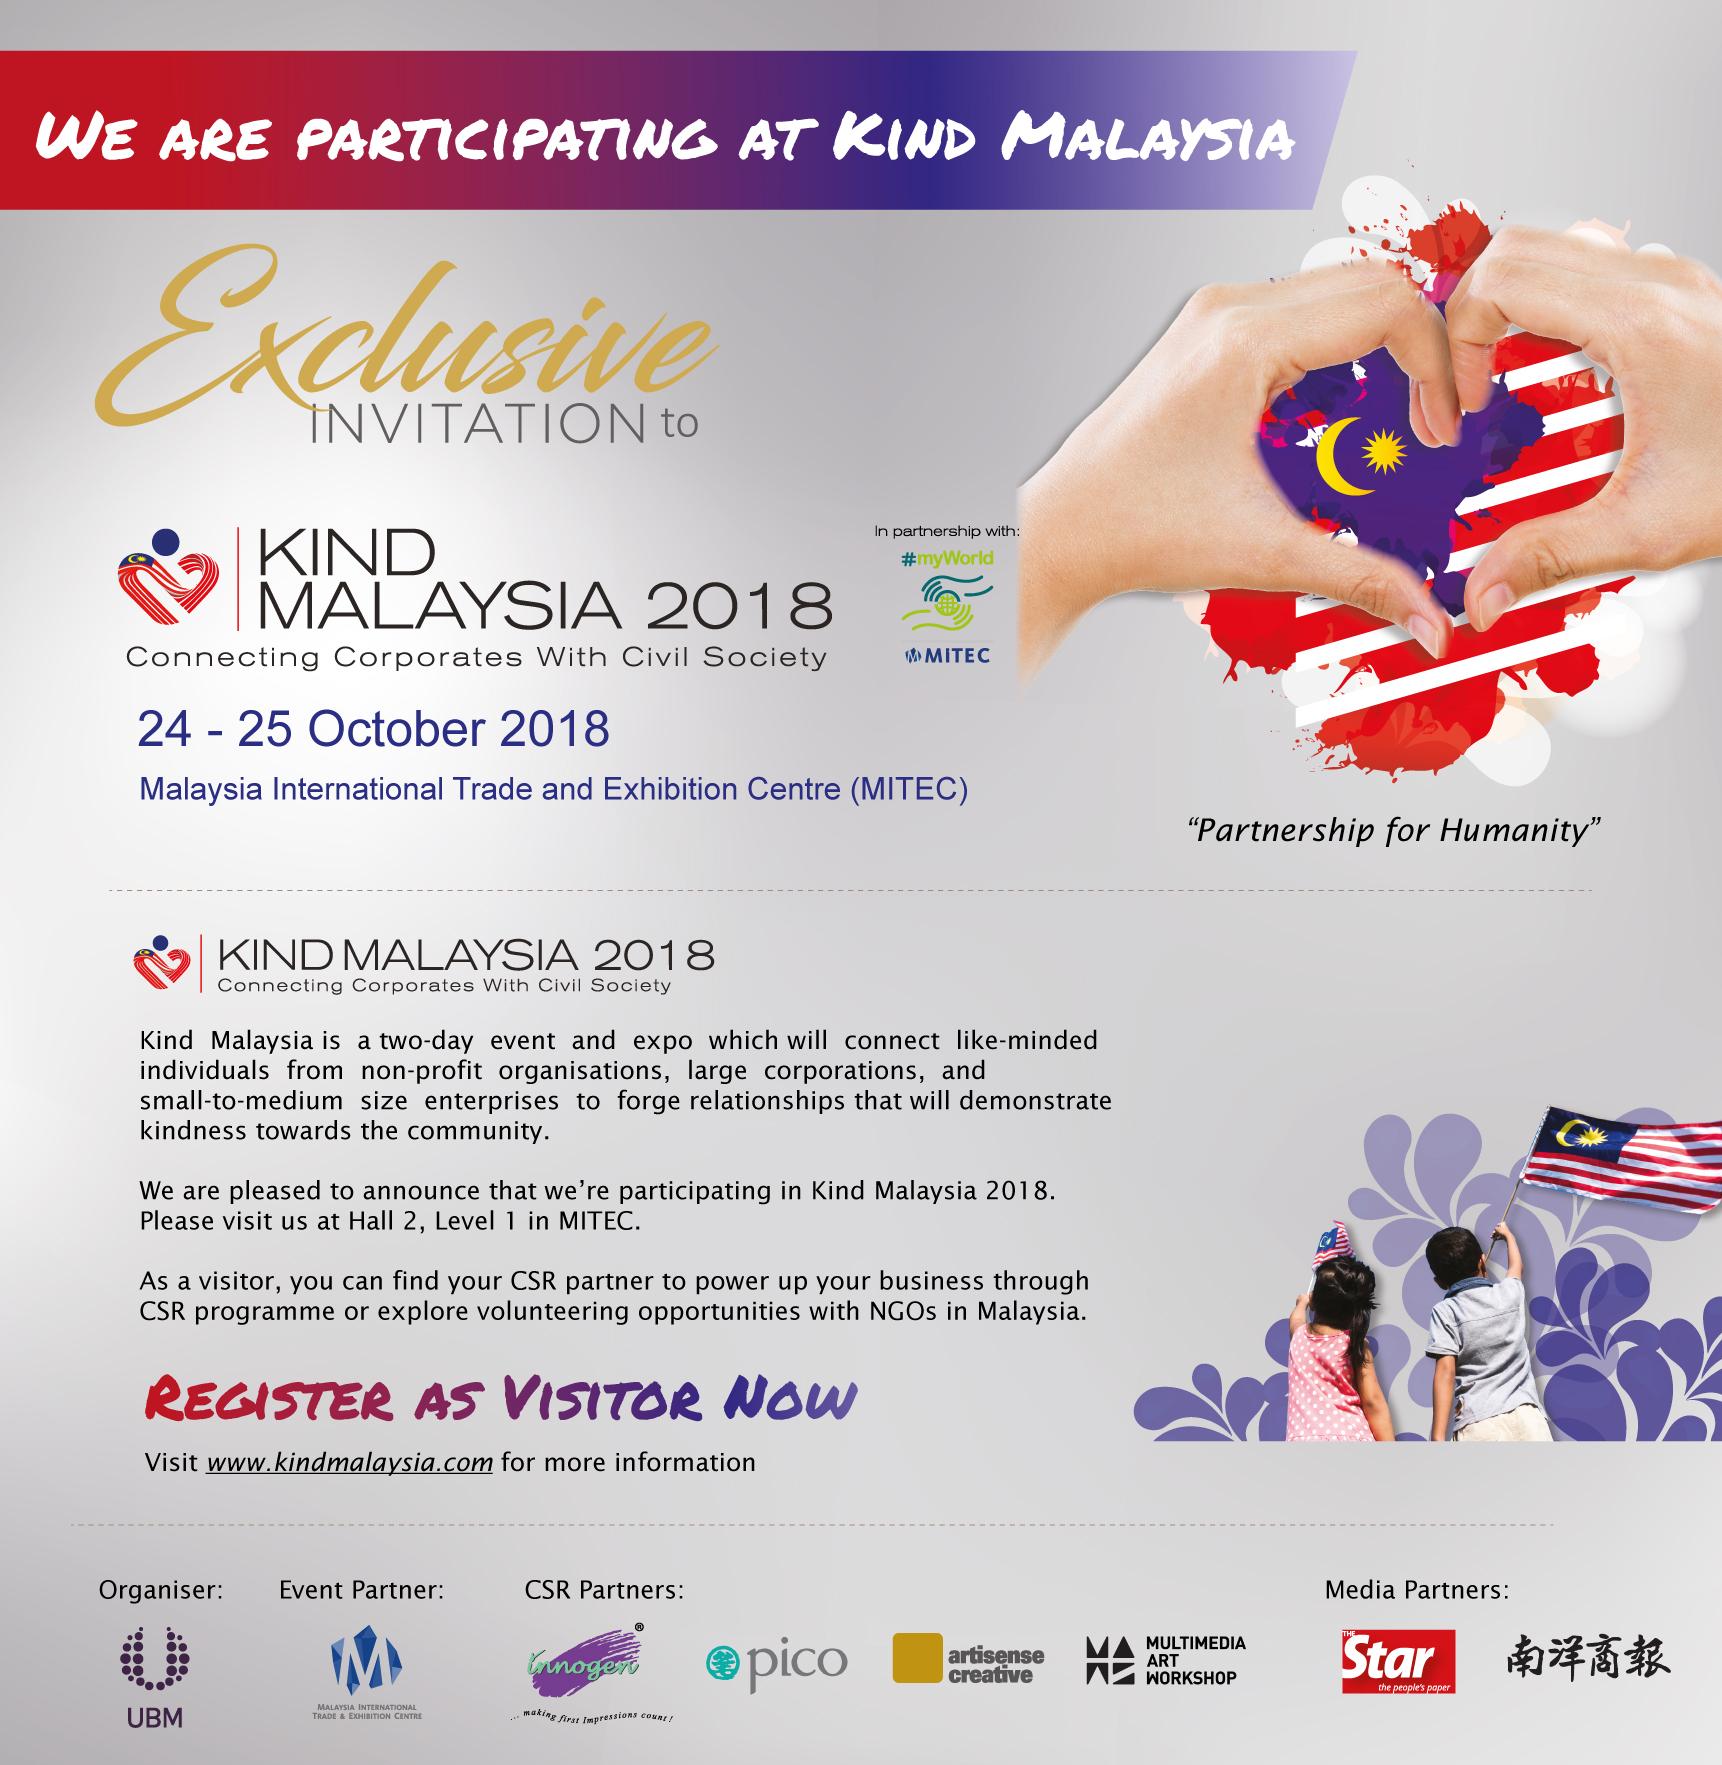 Kind Malaysia 2018